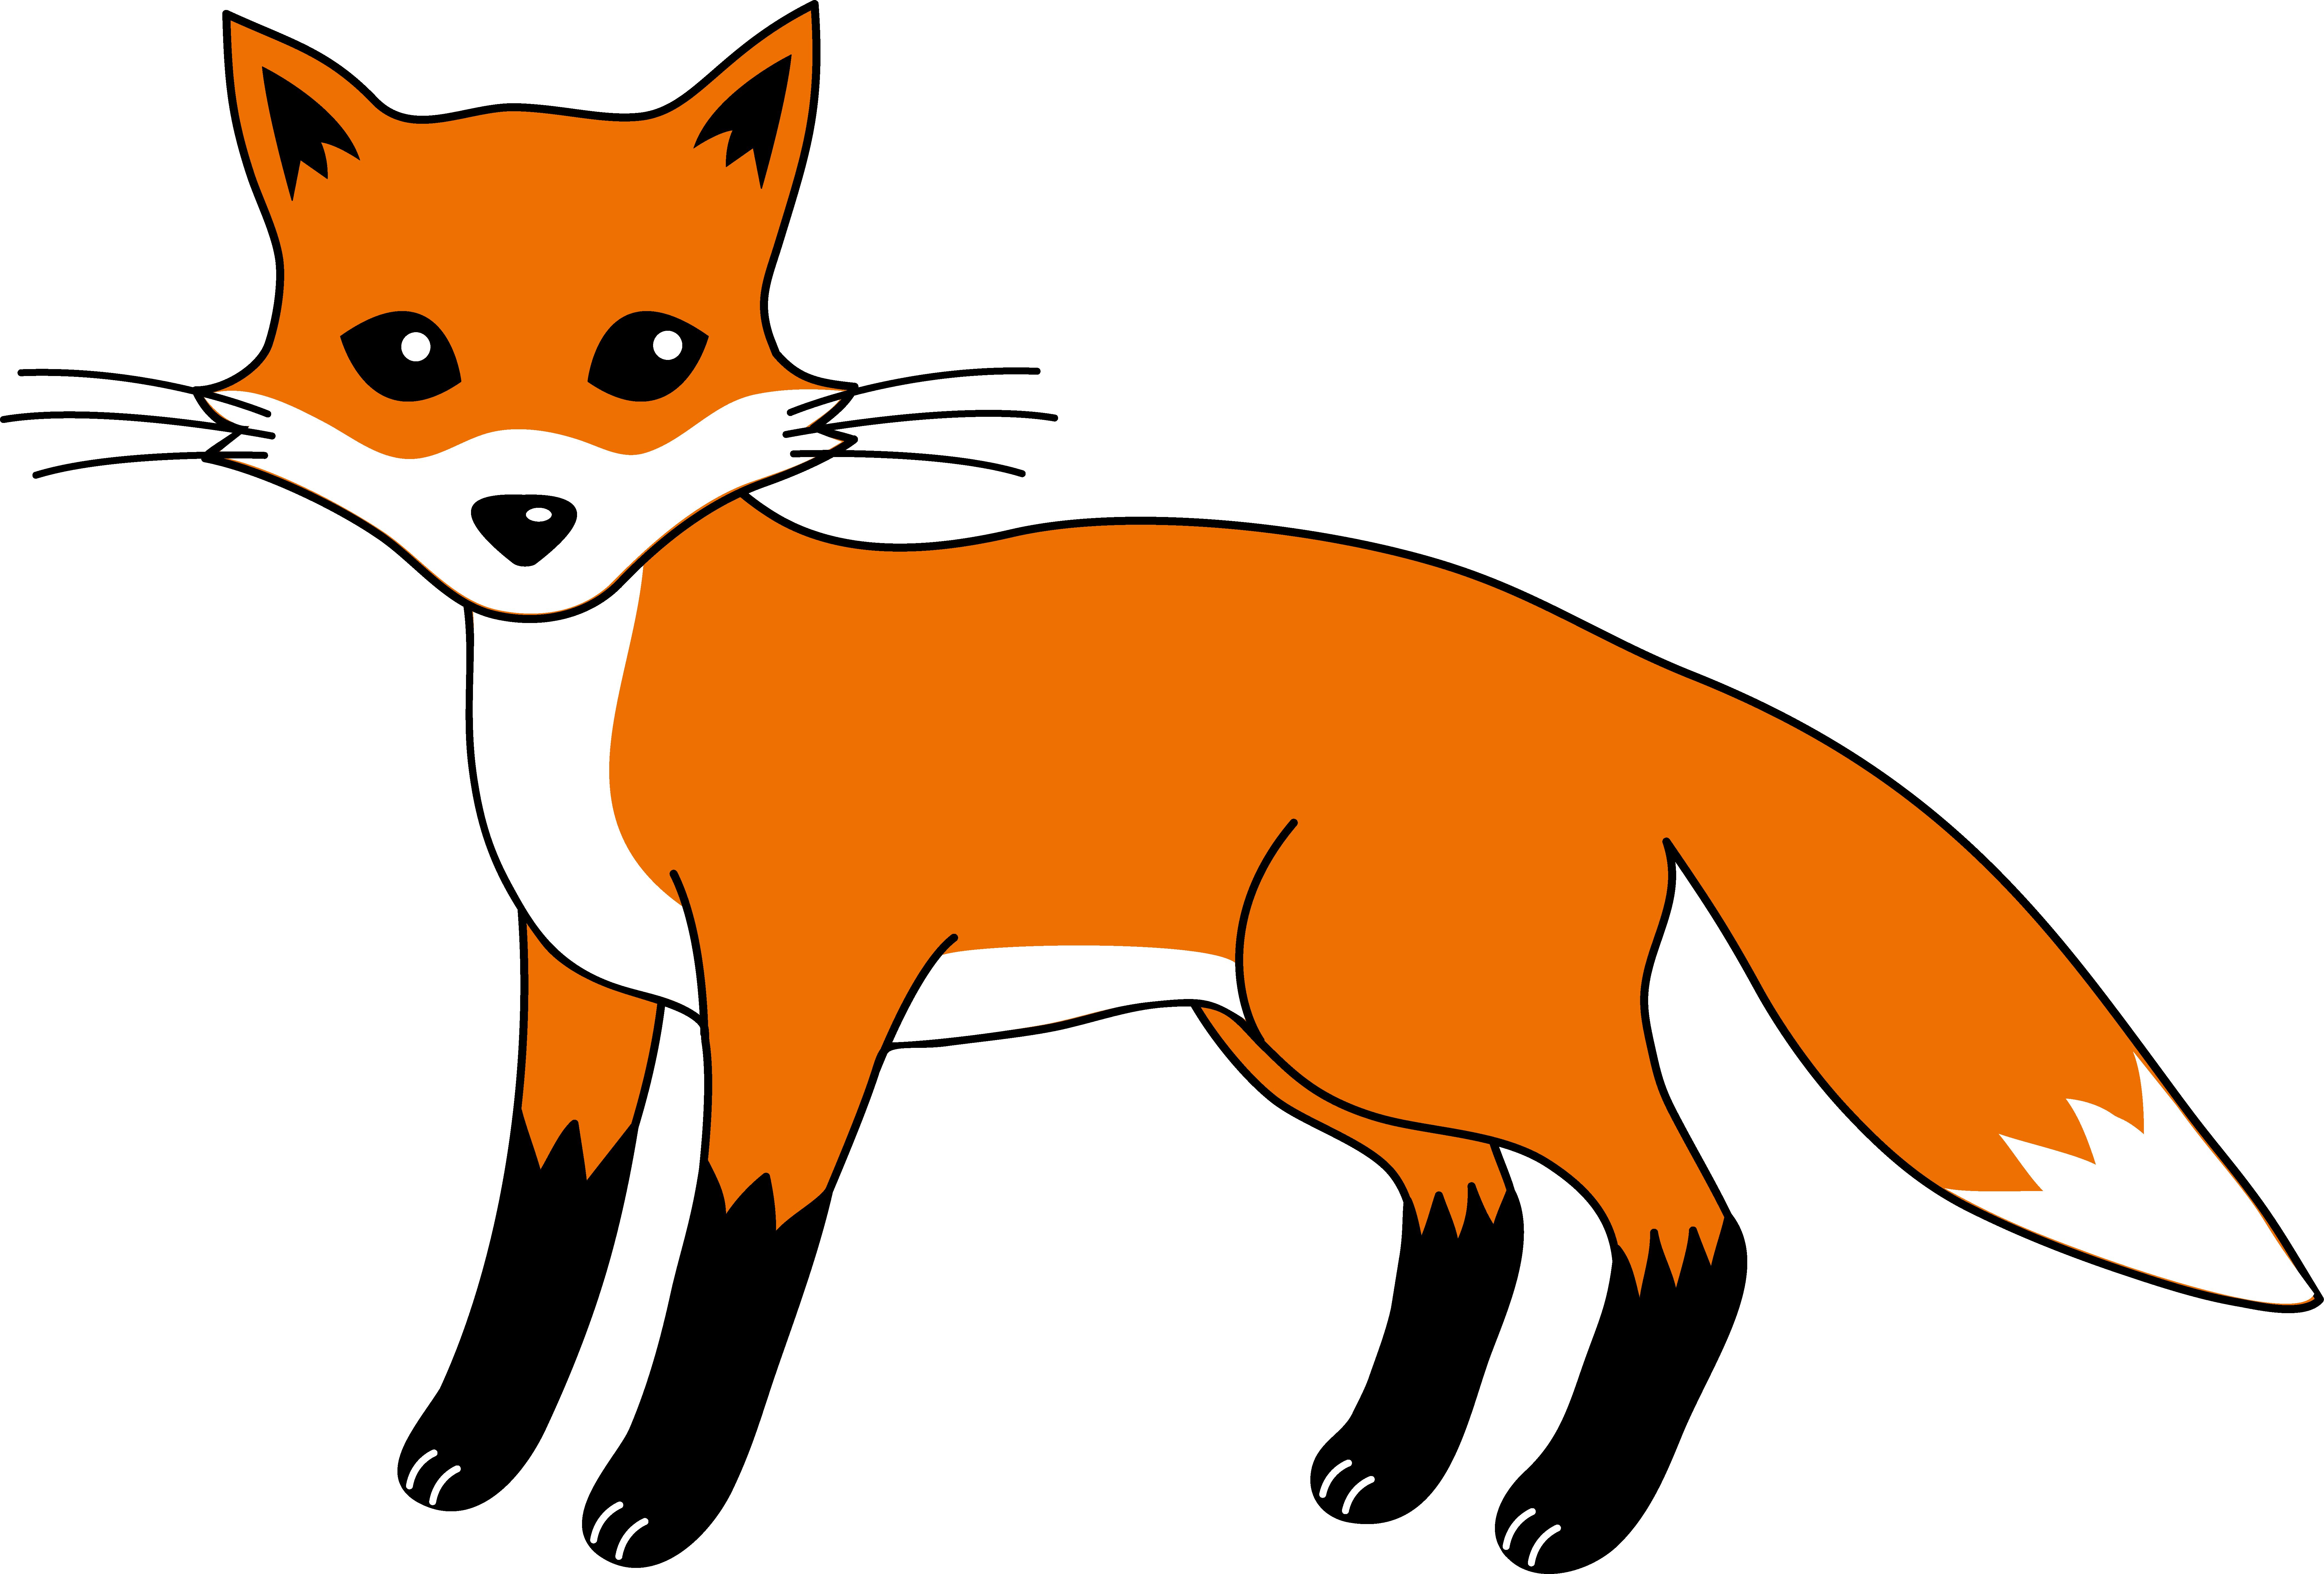 jpg royalty free stock drawing foxes cartoon #111841093